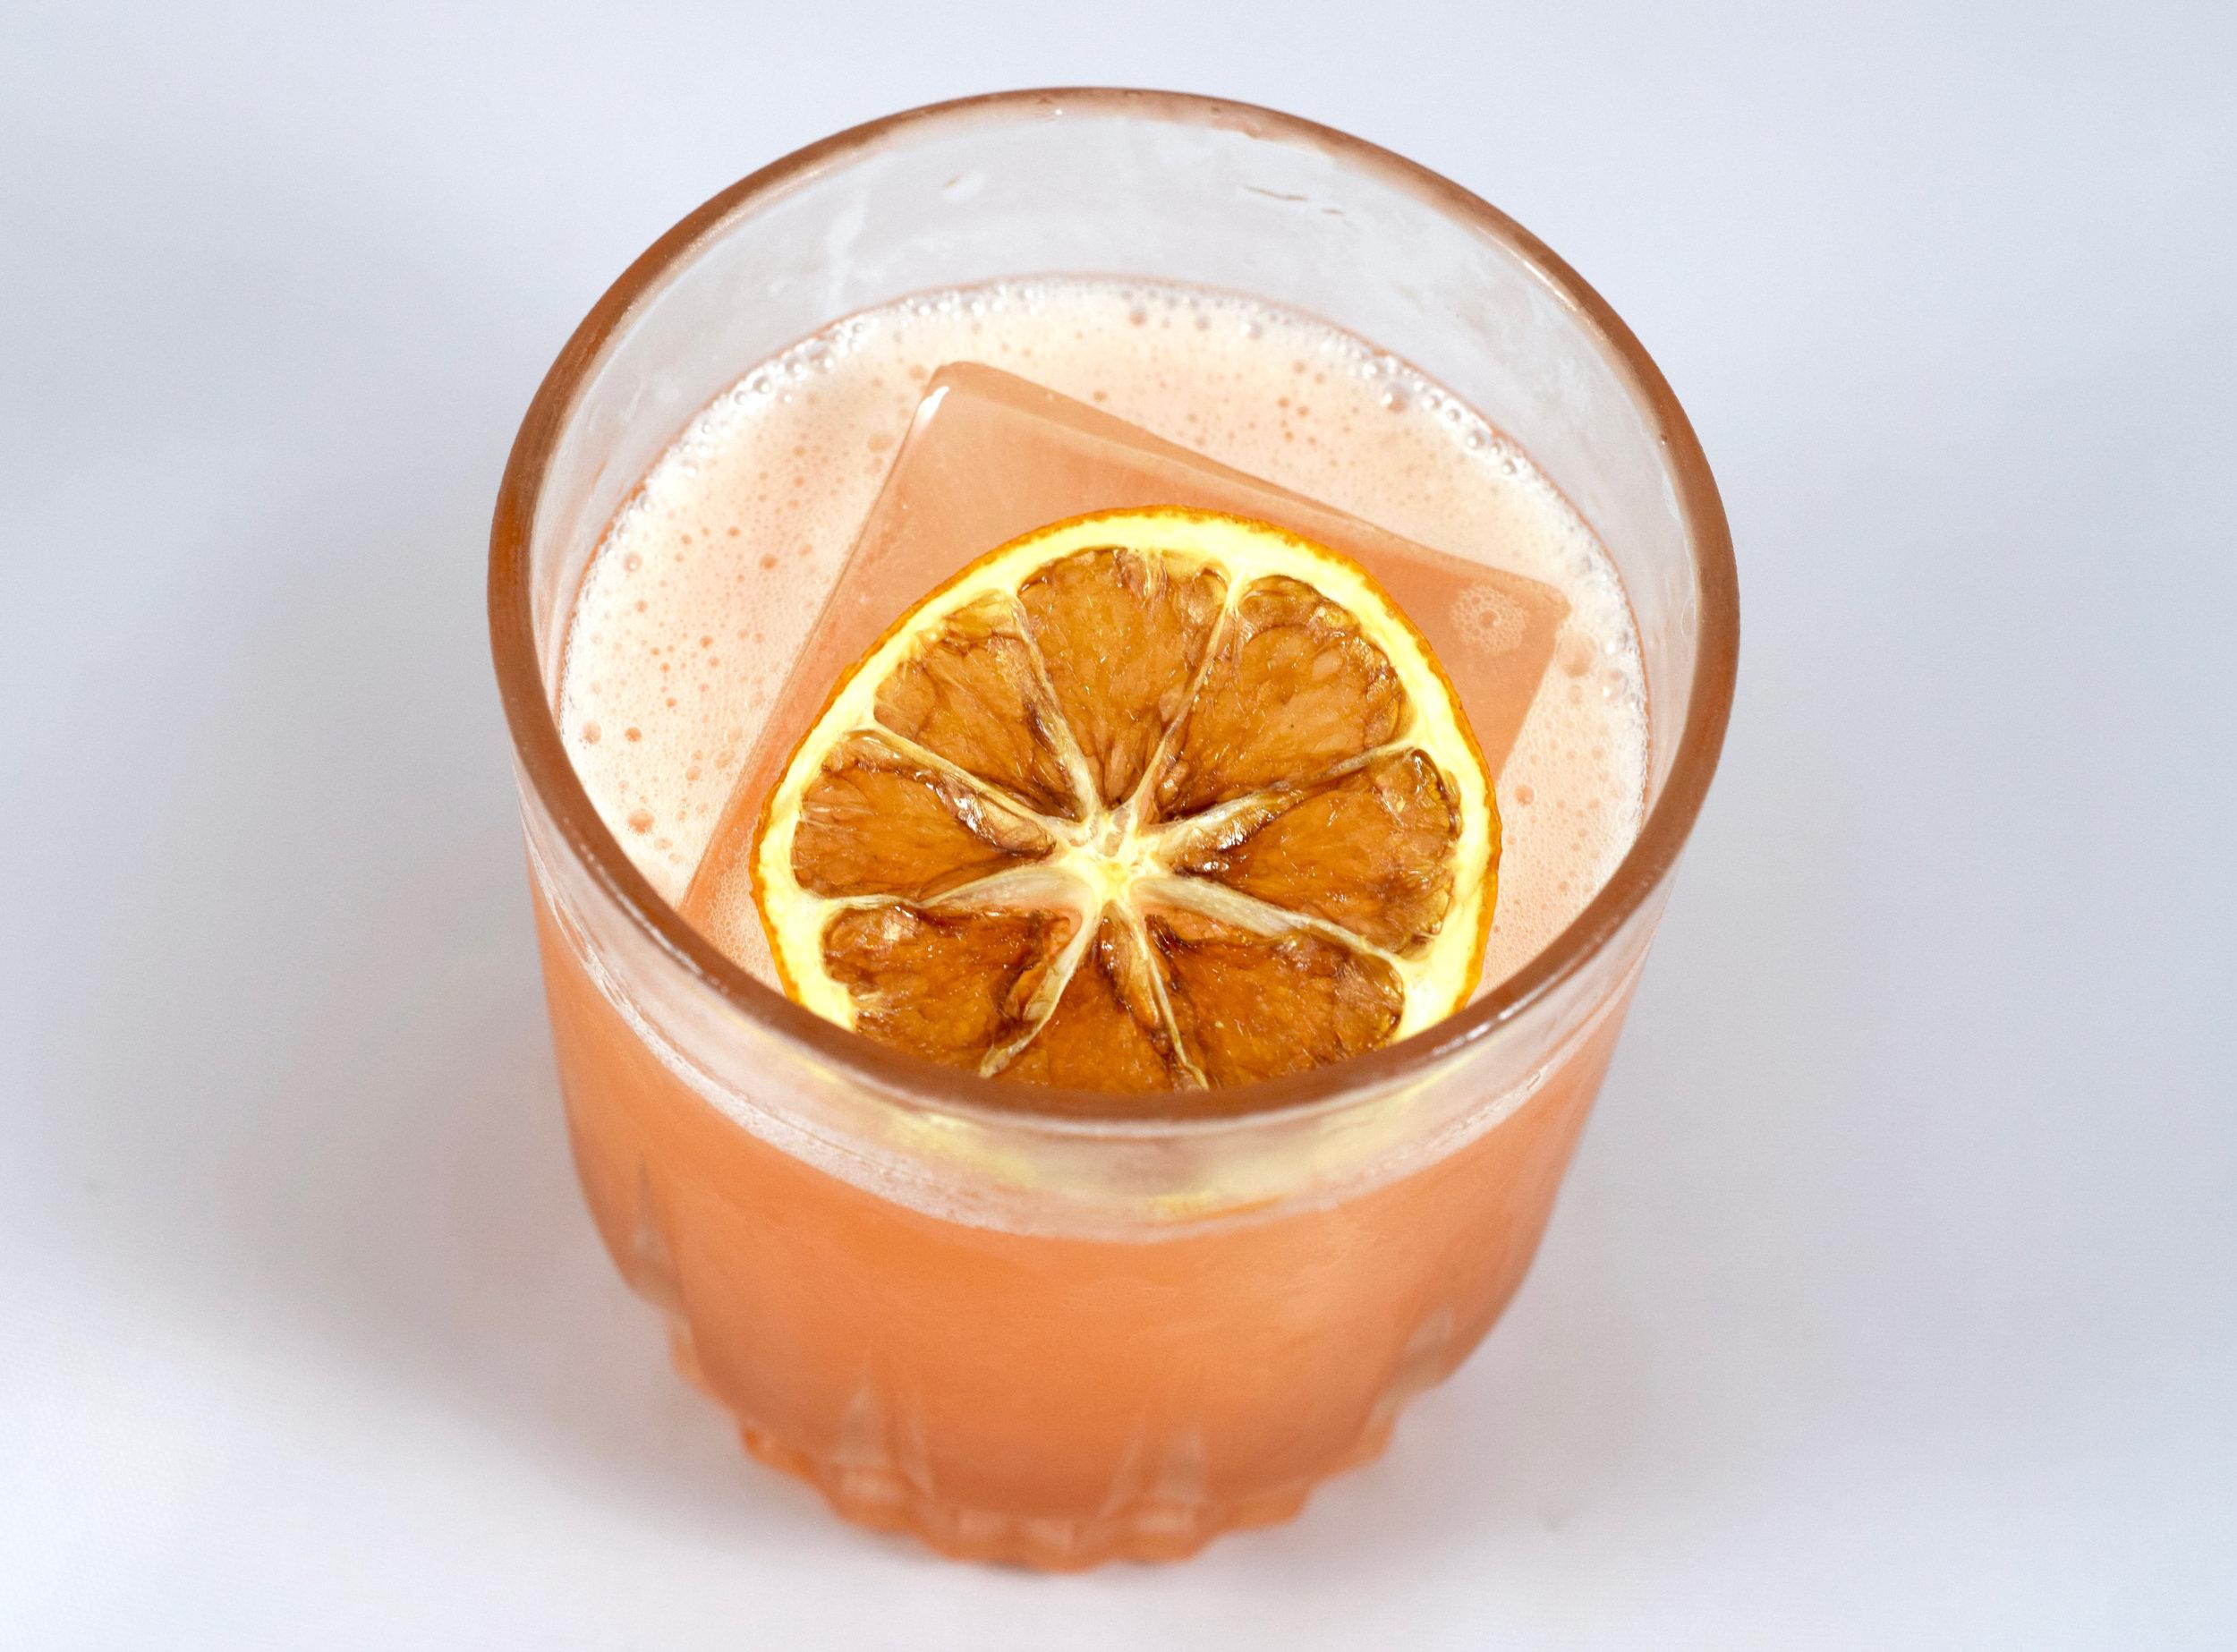 LONGSHIP  - 1.5 oz aquavit1/2 oz aperol1/2 oz nostrum strawberry cascara ginger shrub3/4 oz fresh lemon juice1/2 oz cinnamon syrupShake with ice and strain.